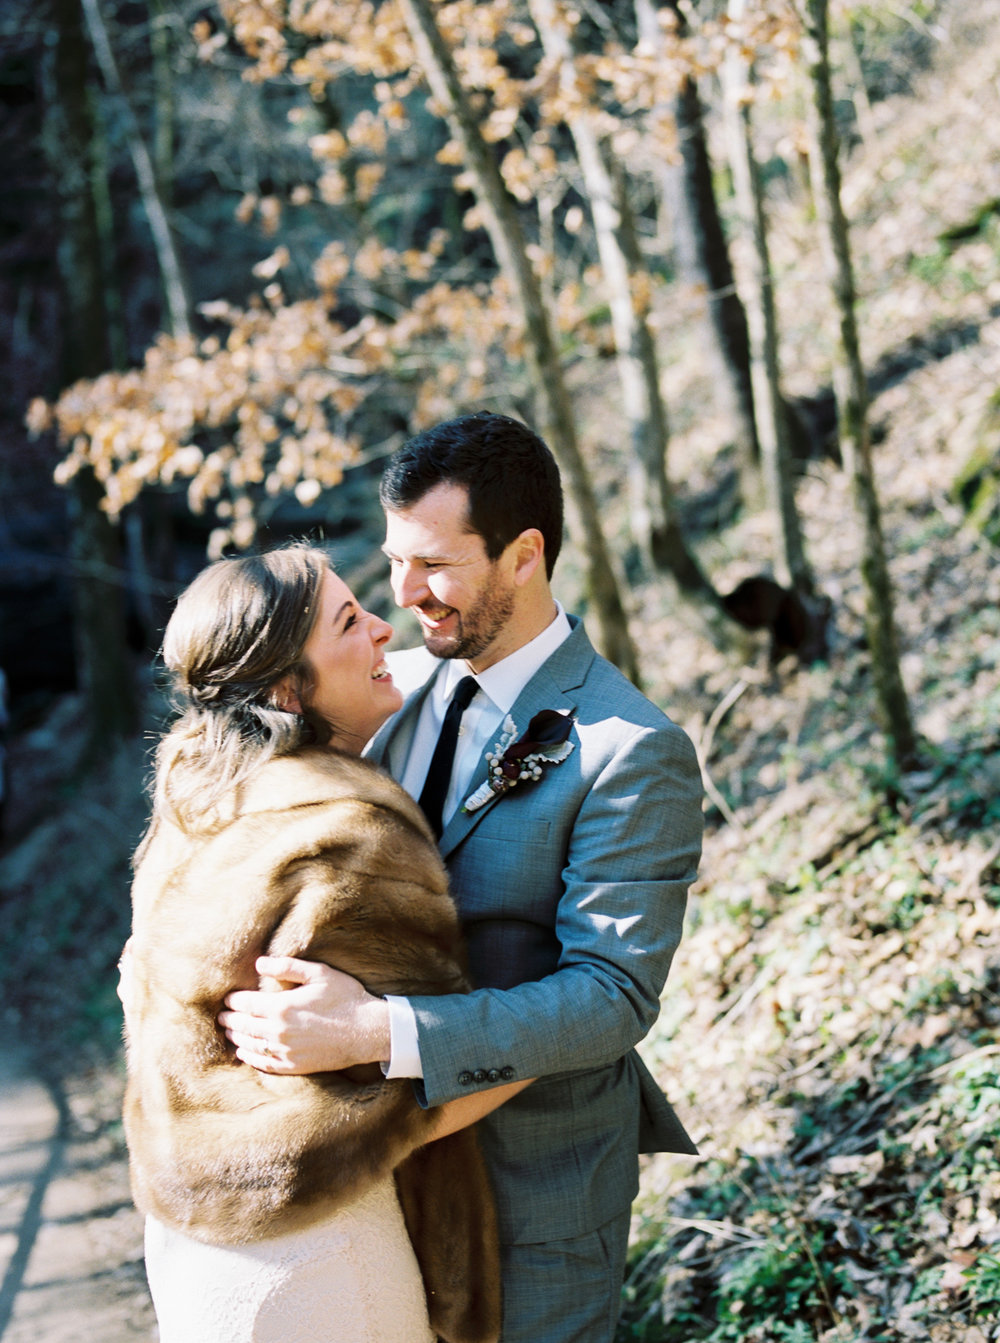 laurel+kelly_natchez_trace_grays_on_main_franklin_film_wedding_photographers©2017abigailbobophotography-15.jpg